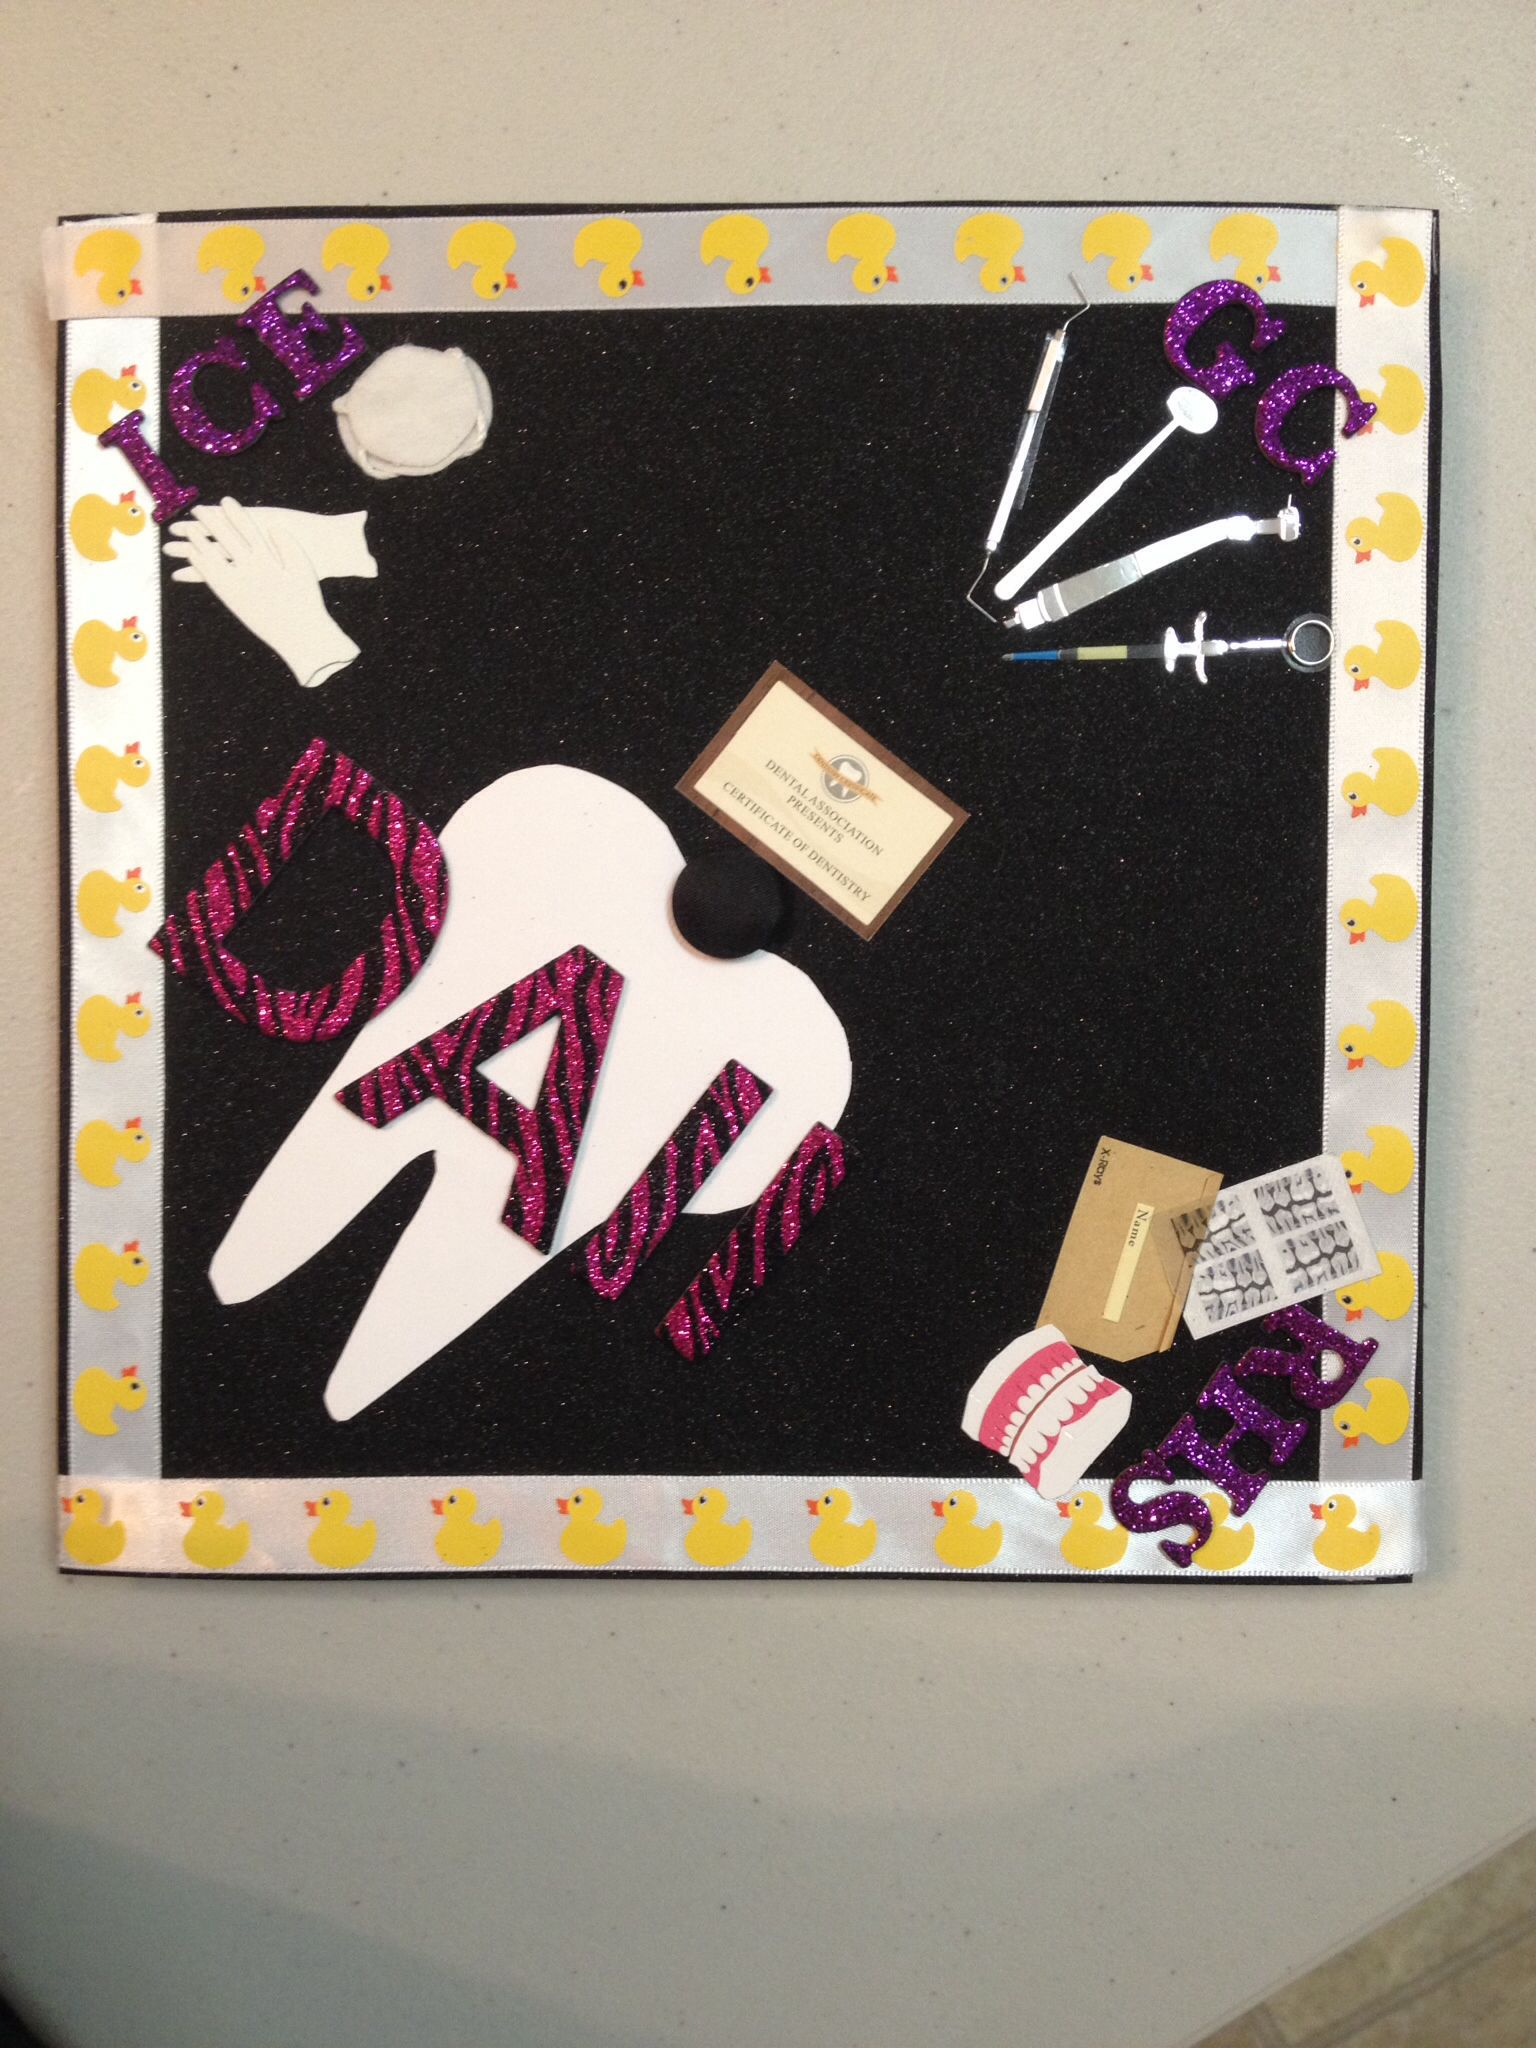 My graduation cap celebrating graduating from the dental assistant program.